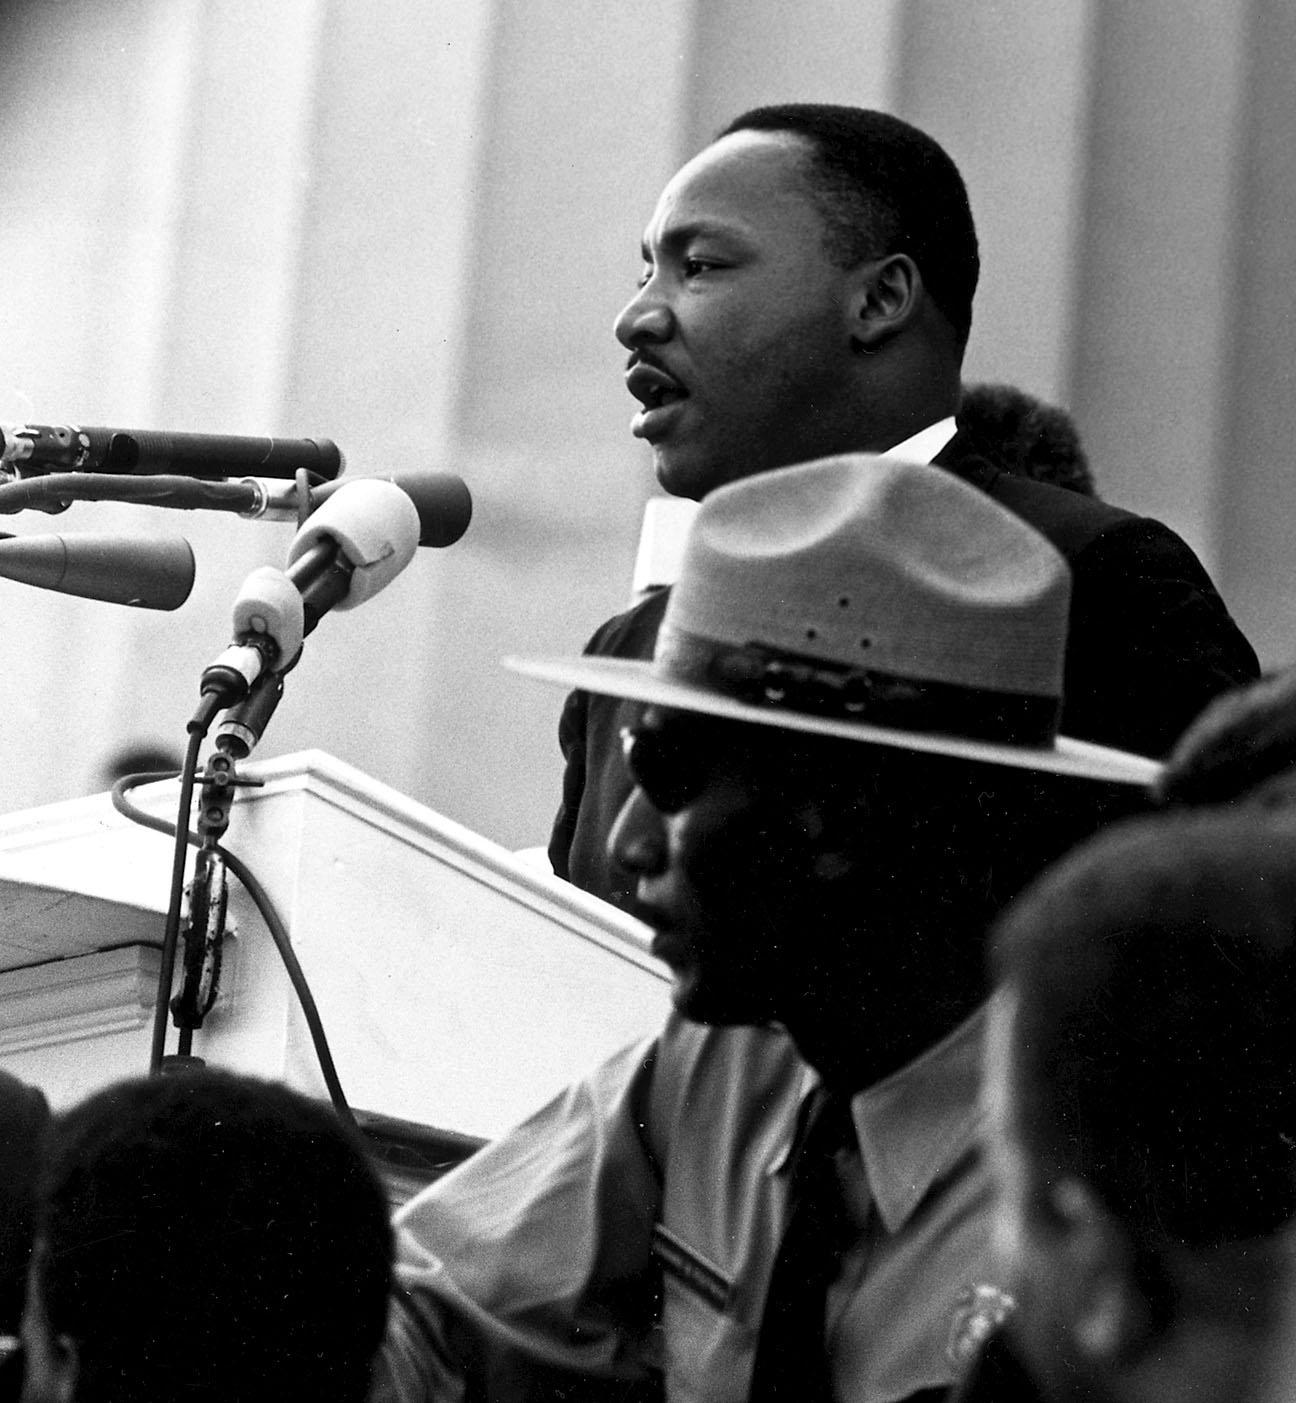 RS_blog_Martin_Luther_King__Jr_I_have_a_dream_Speech.jpg